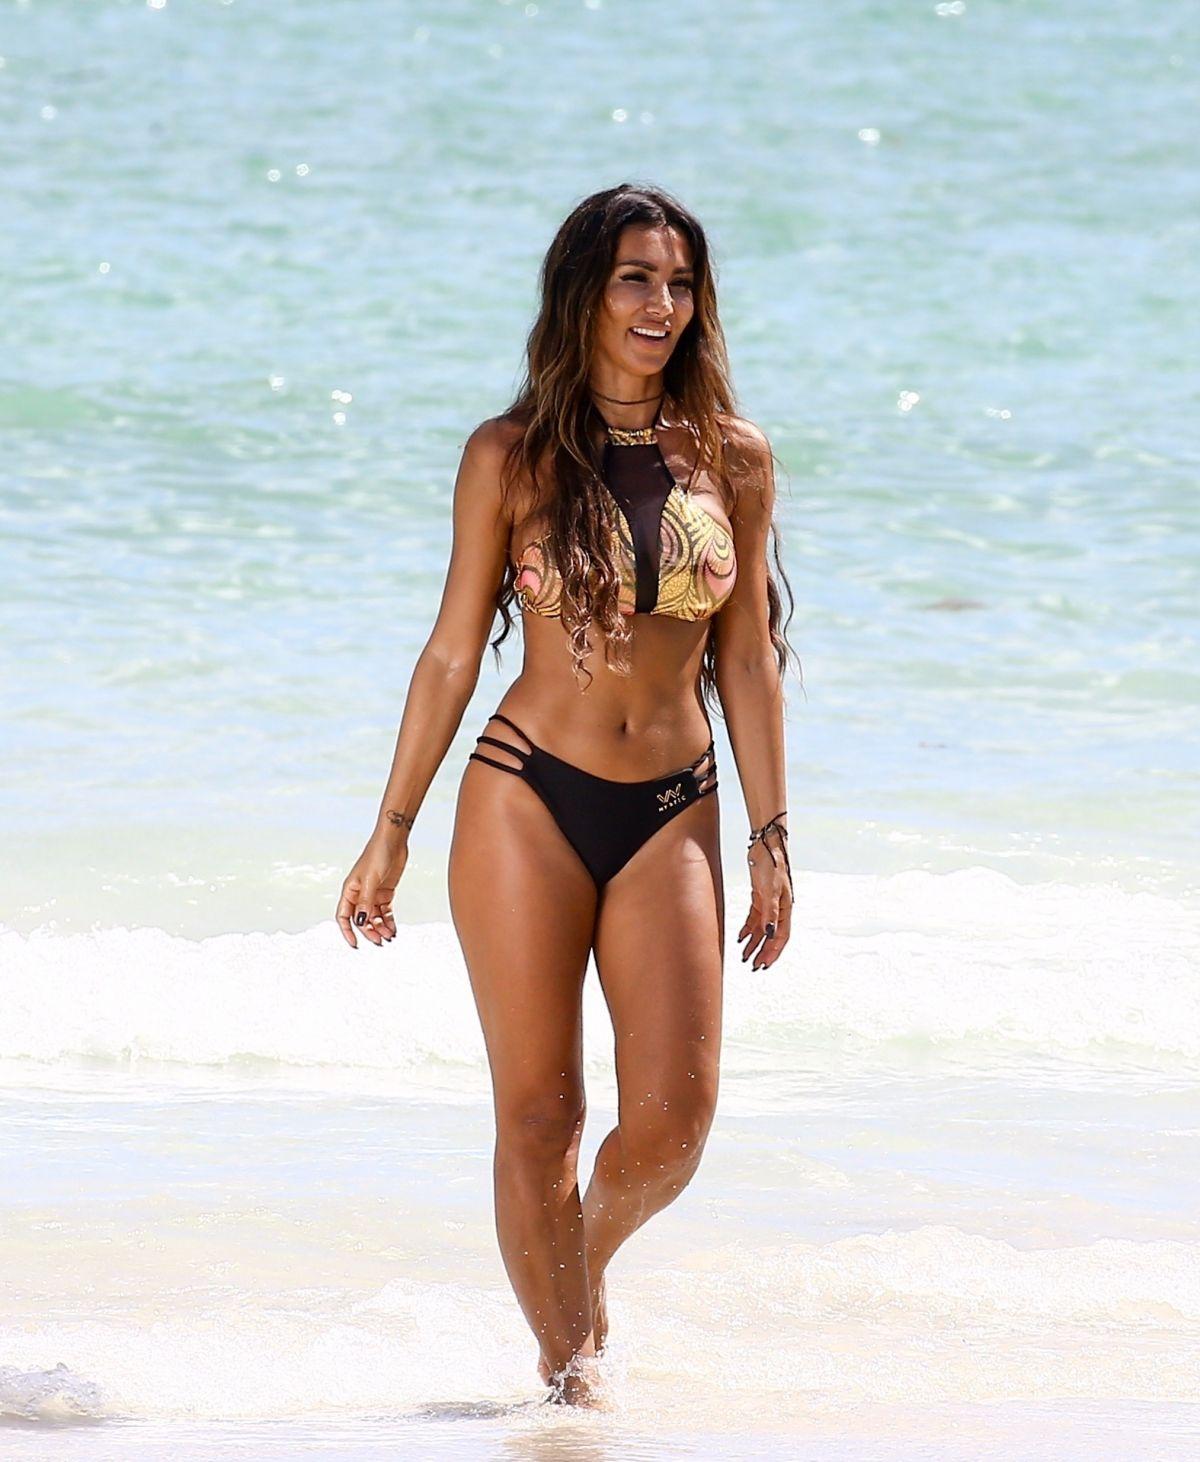 Metisha Schaefer Bikini Photoshoot on Miami Beach Pic 20 of 35